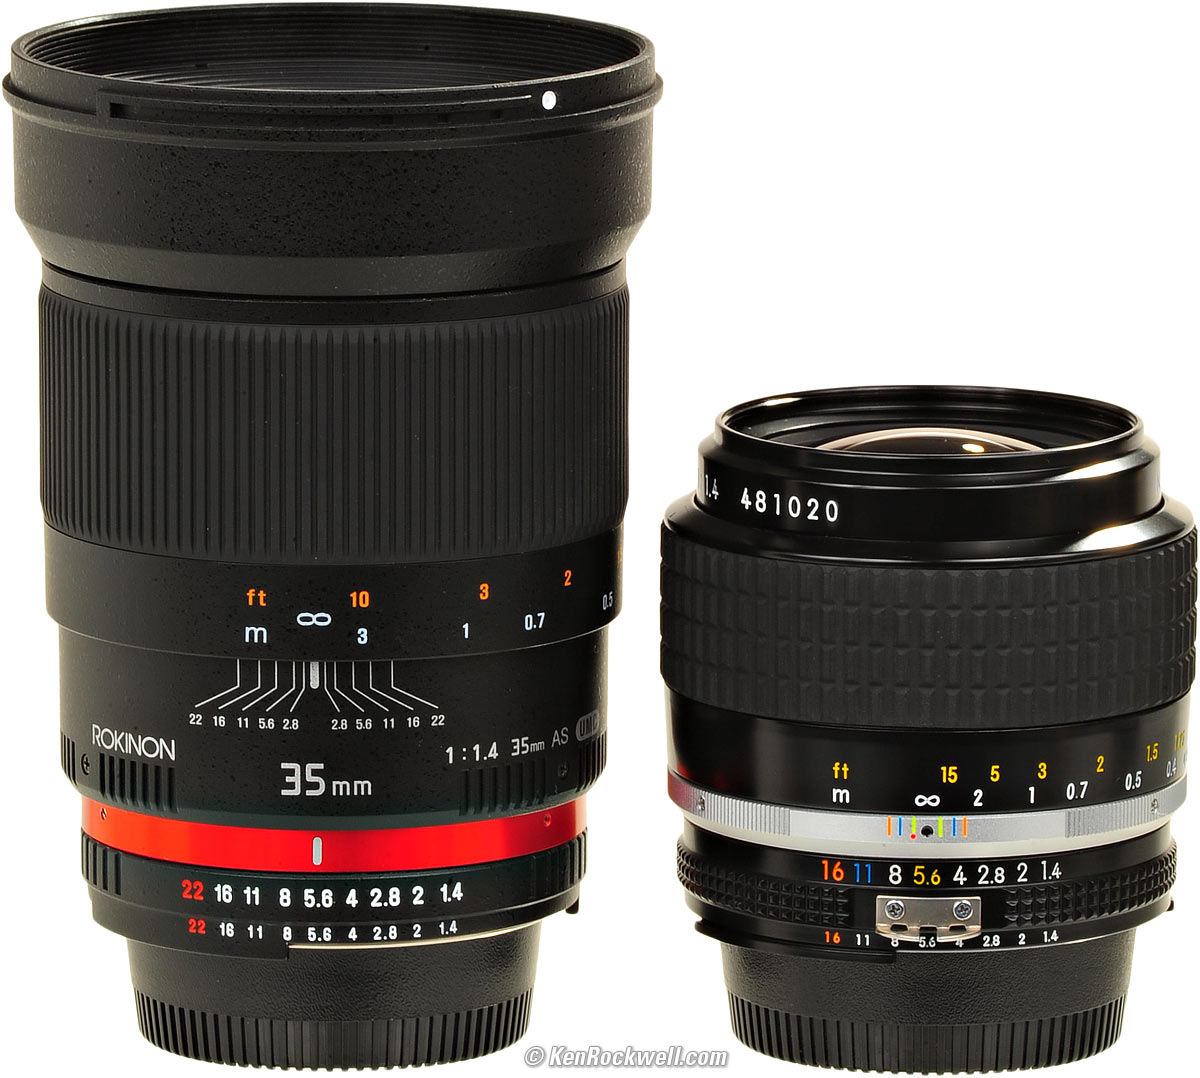 samyang 35mm f1 4 canon review